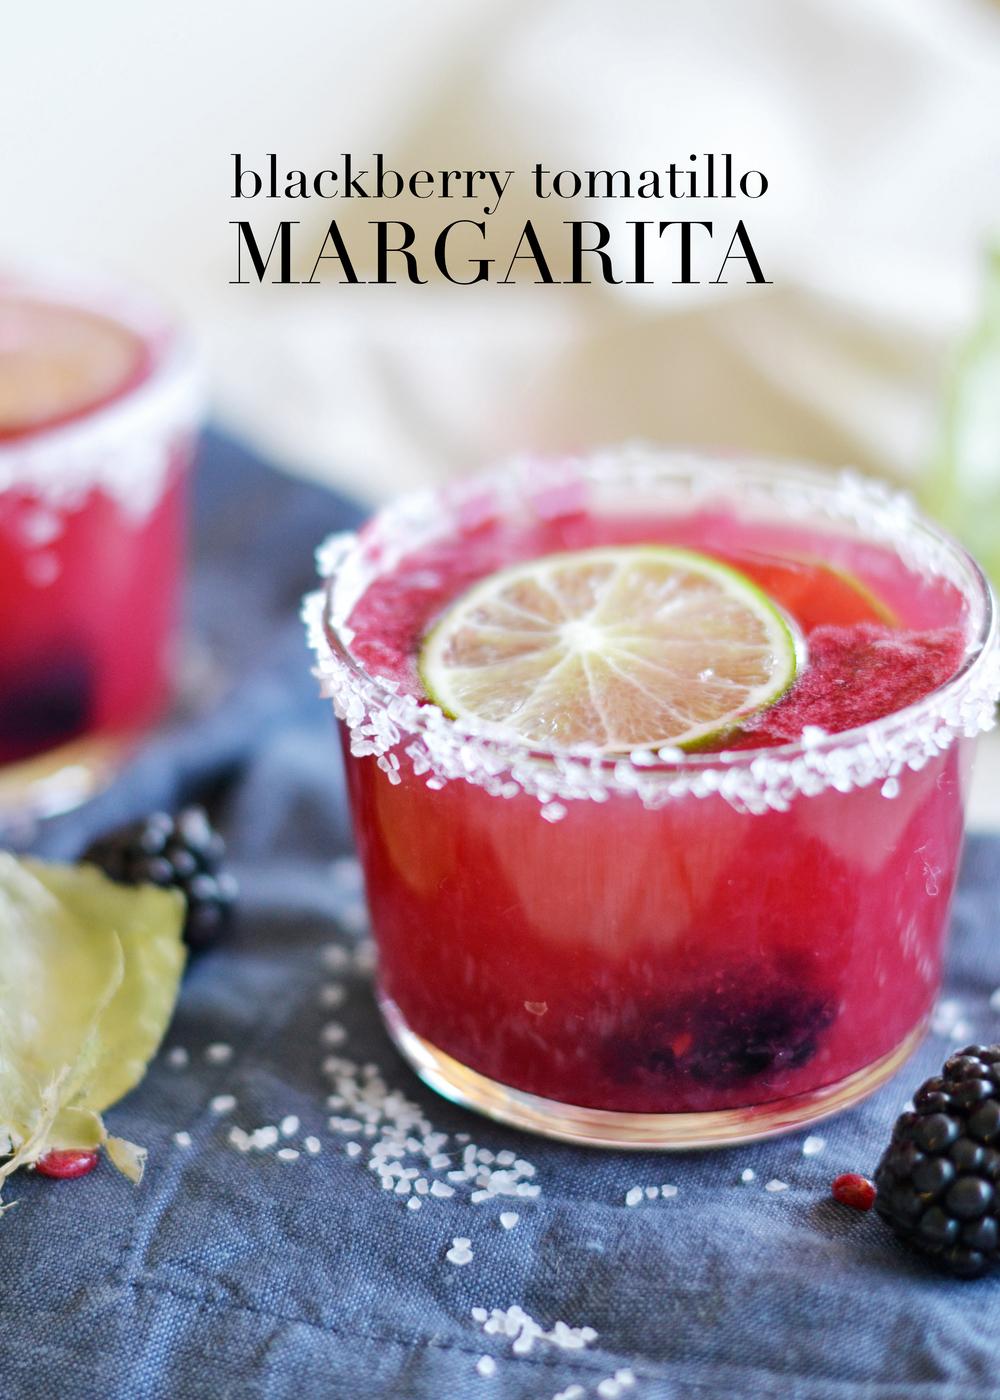 A unique margarita // Tomatillo preserves make this margarita savory! boxwoodavenue.com